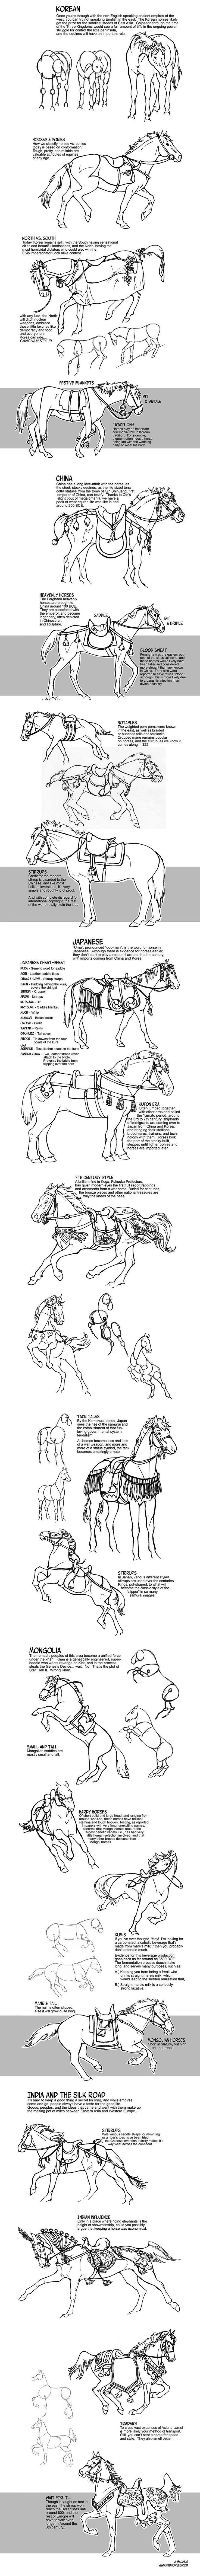 Historic Asian Horses by sketcherjak.devia... on @deviantART